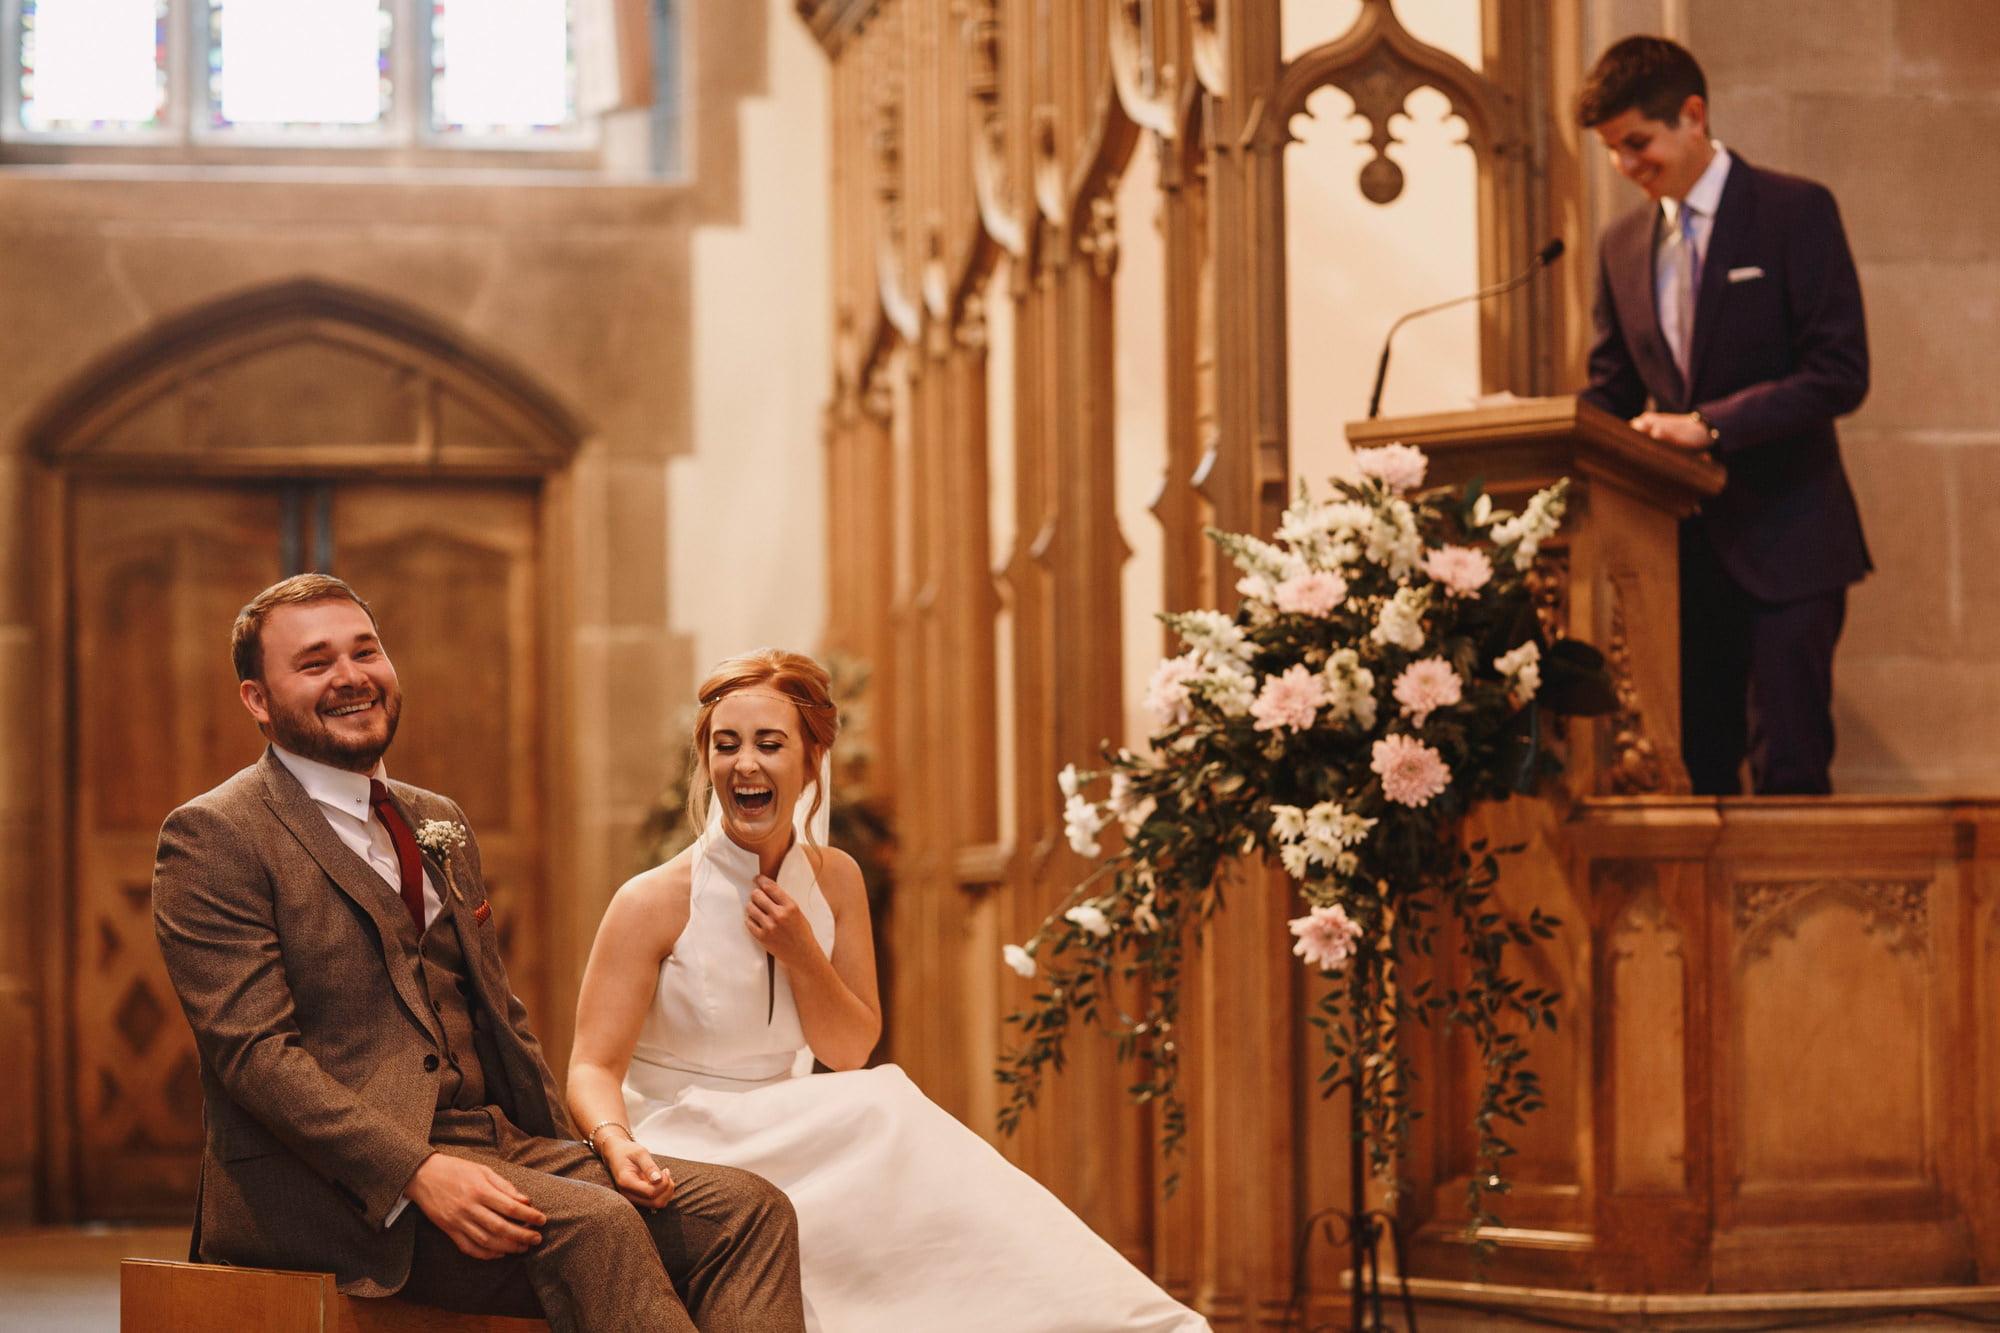 Liverpool wedding photography - church wedding ceremony